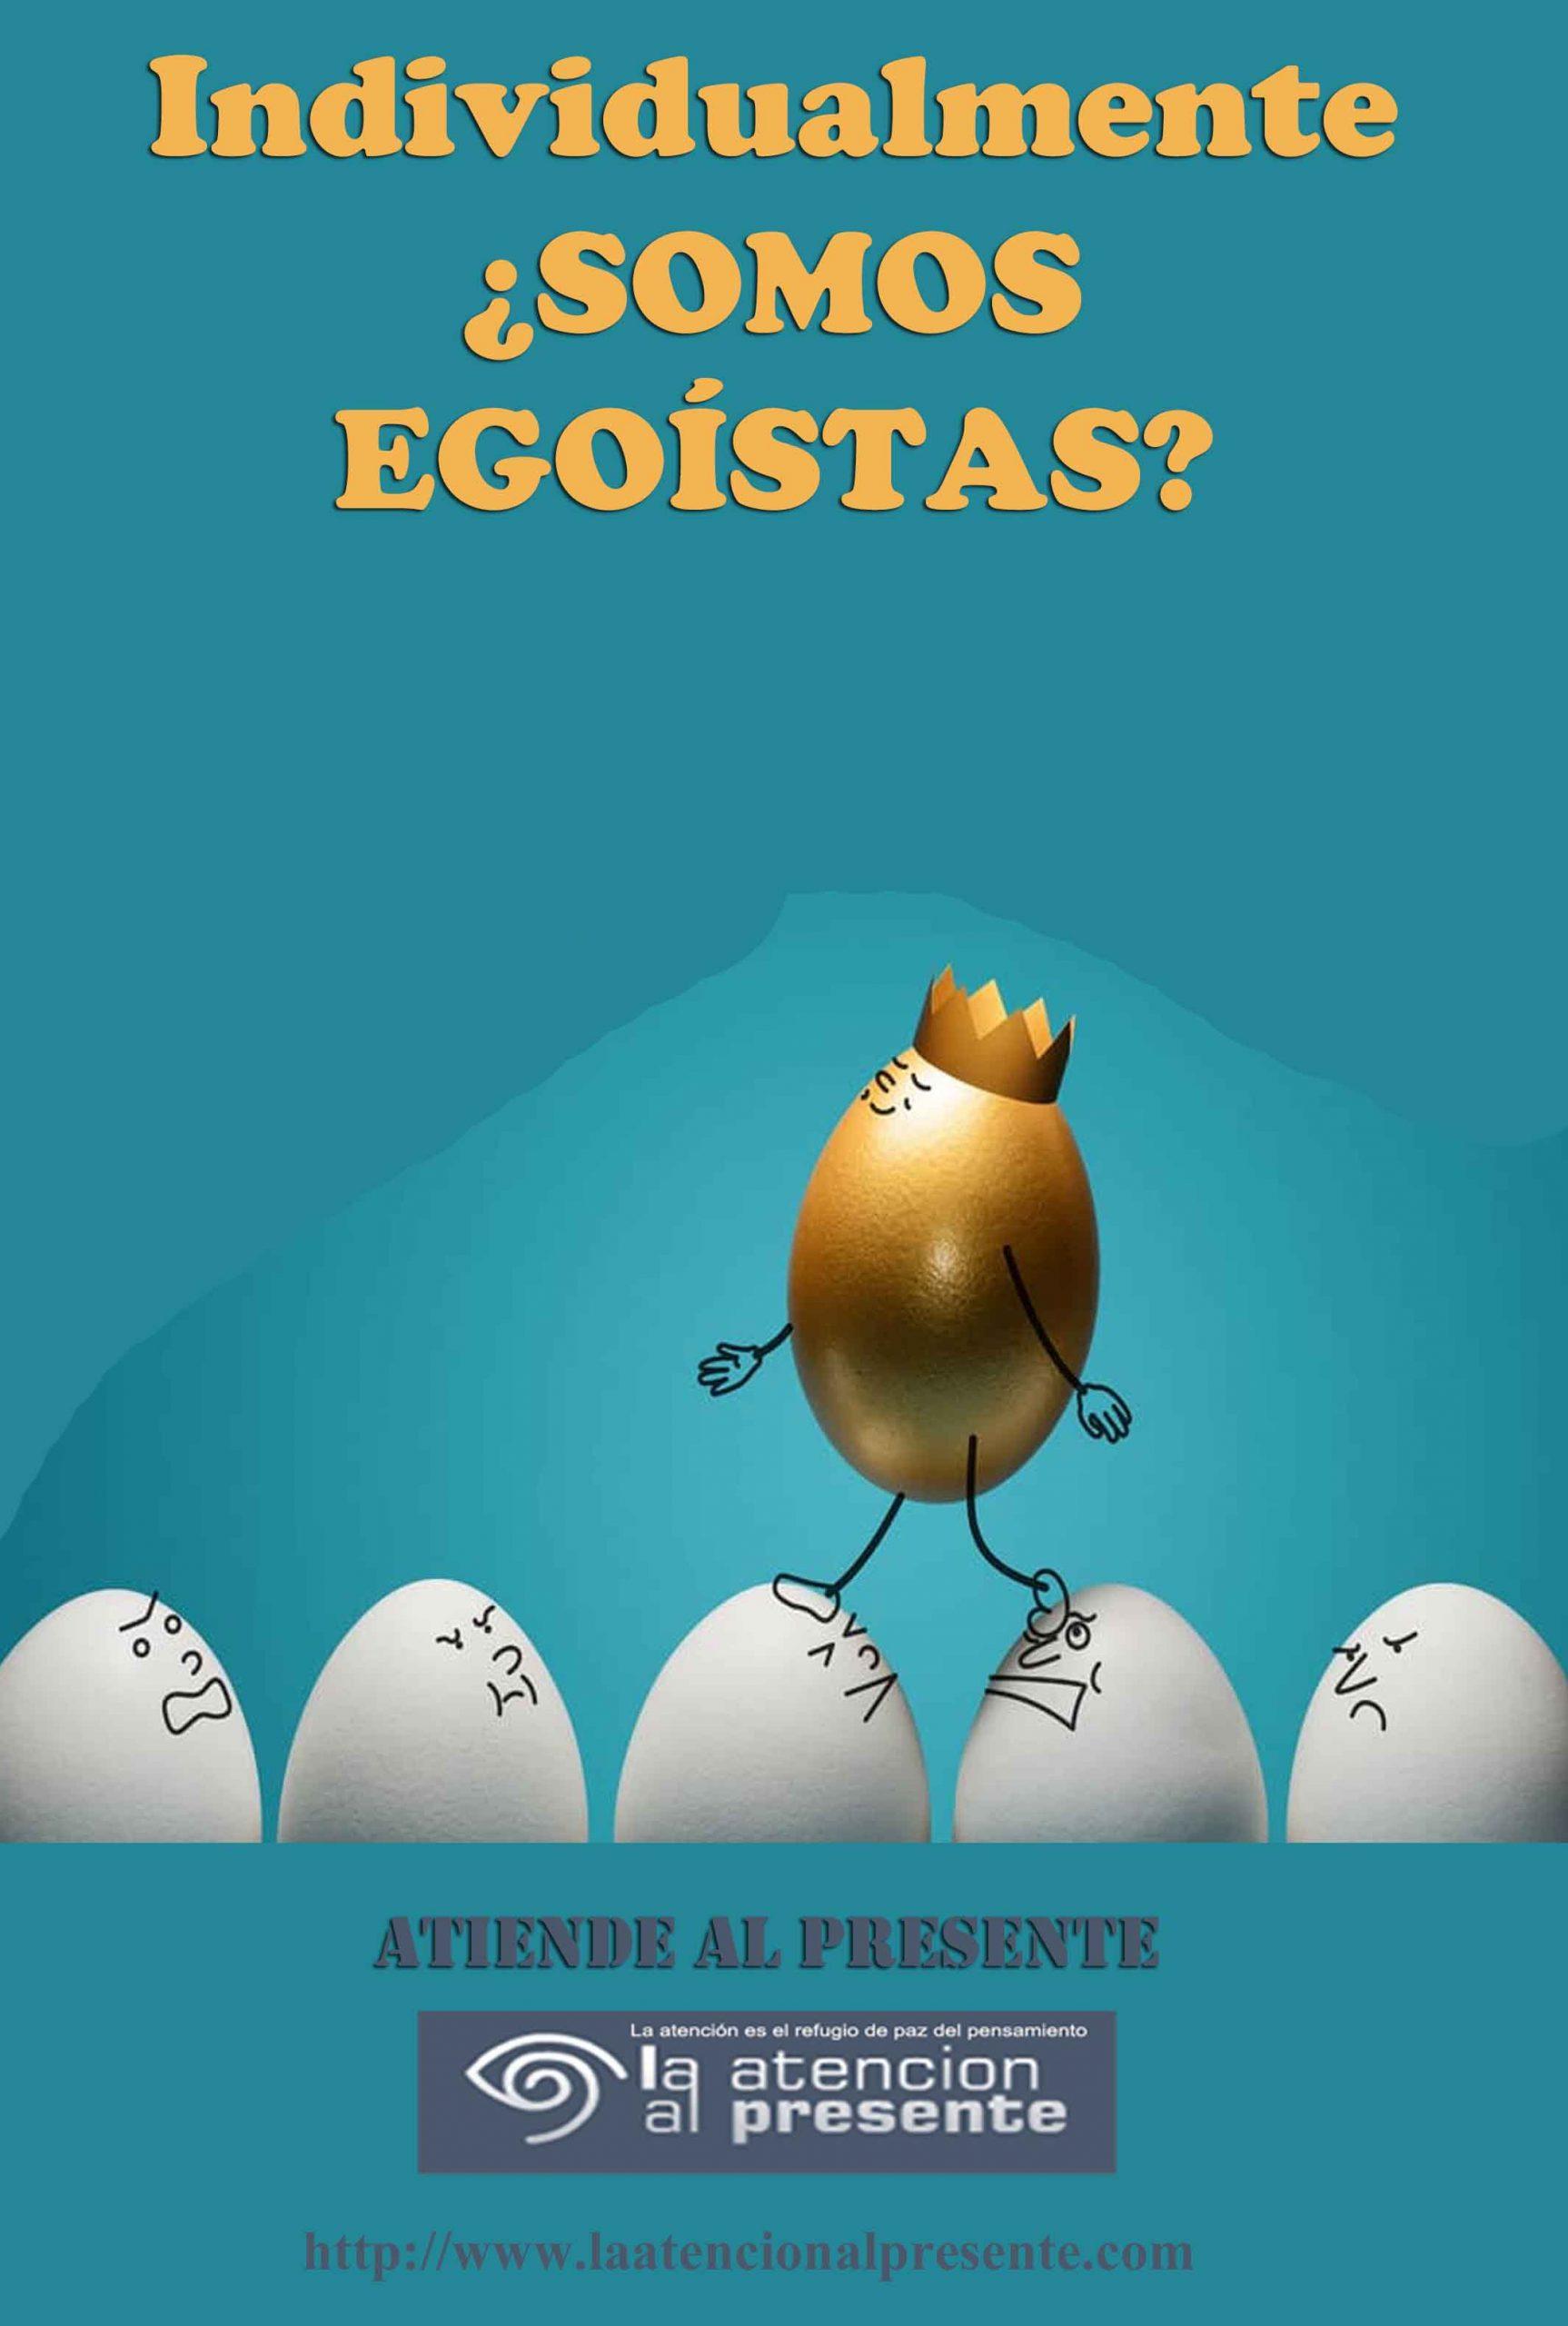 16 de Julio Esteban Individualmente SOMOS EGOISTAS min scaled